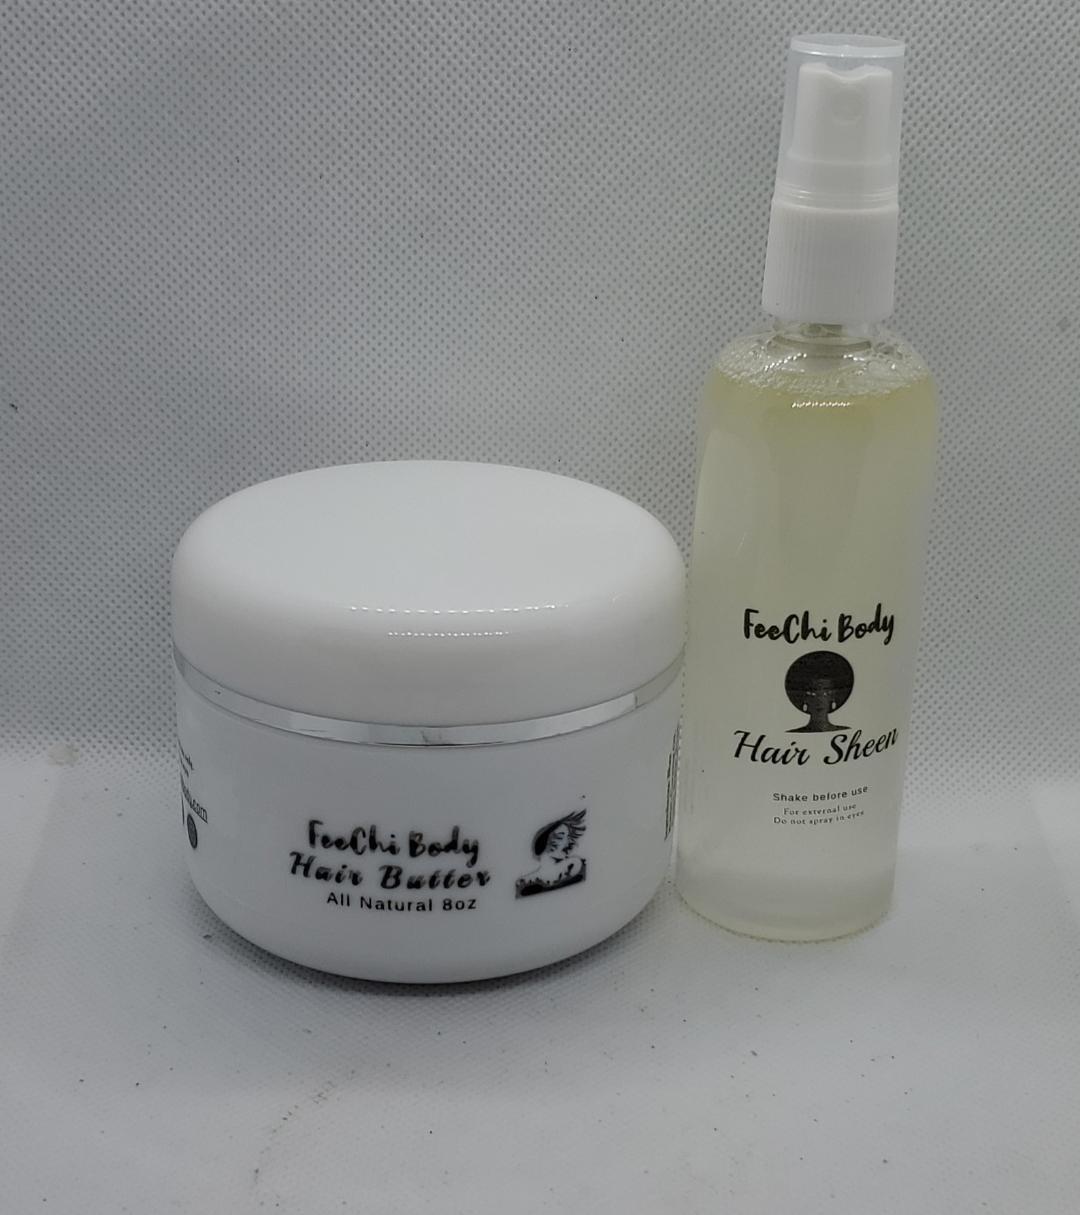 All Natural Hair Care Kit